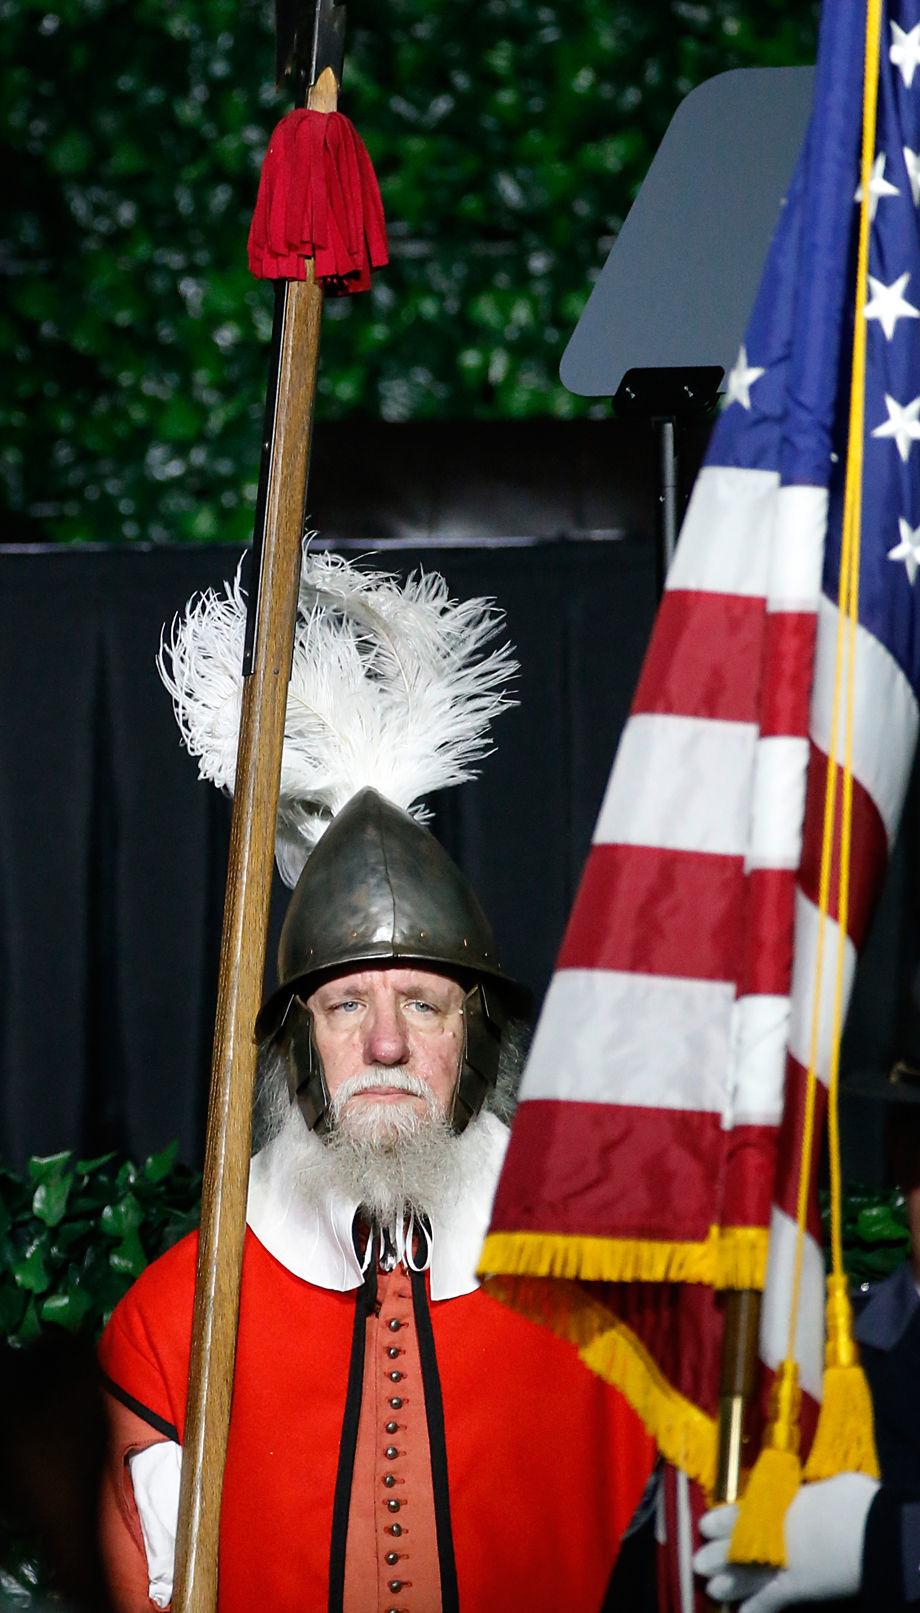 1619 commemoration